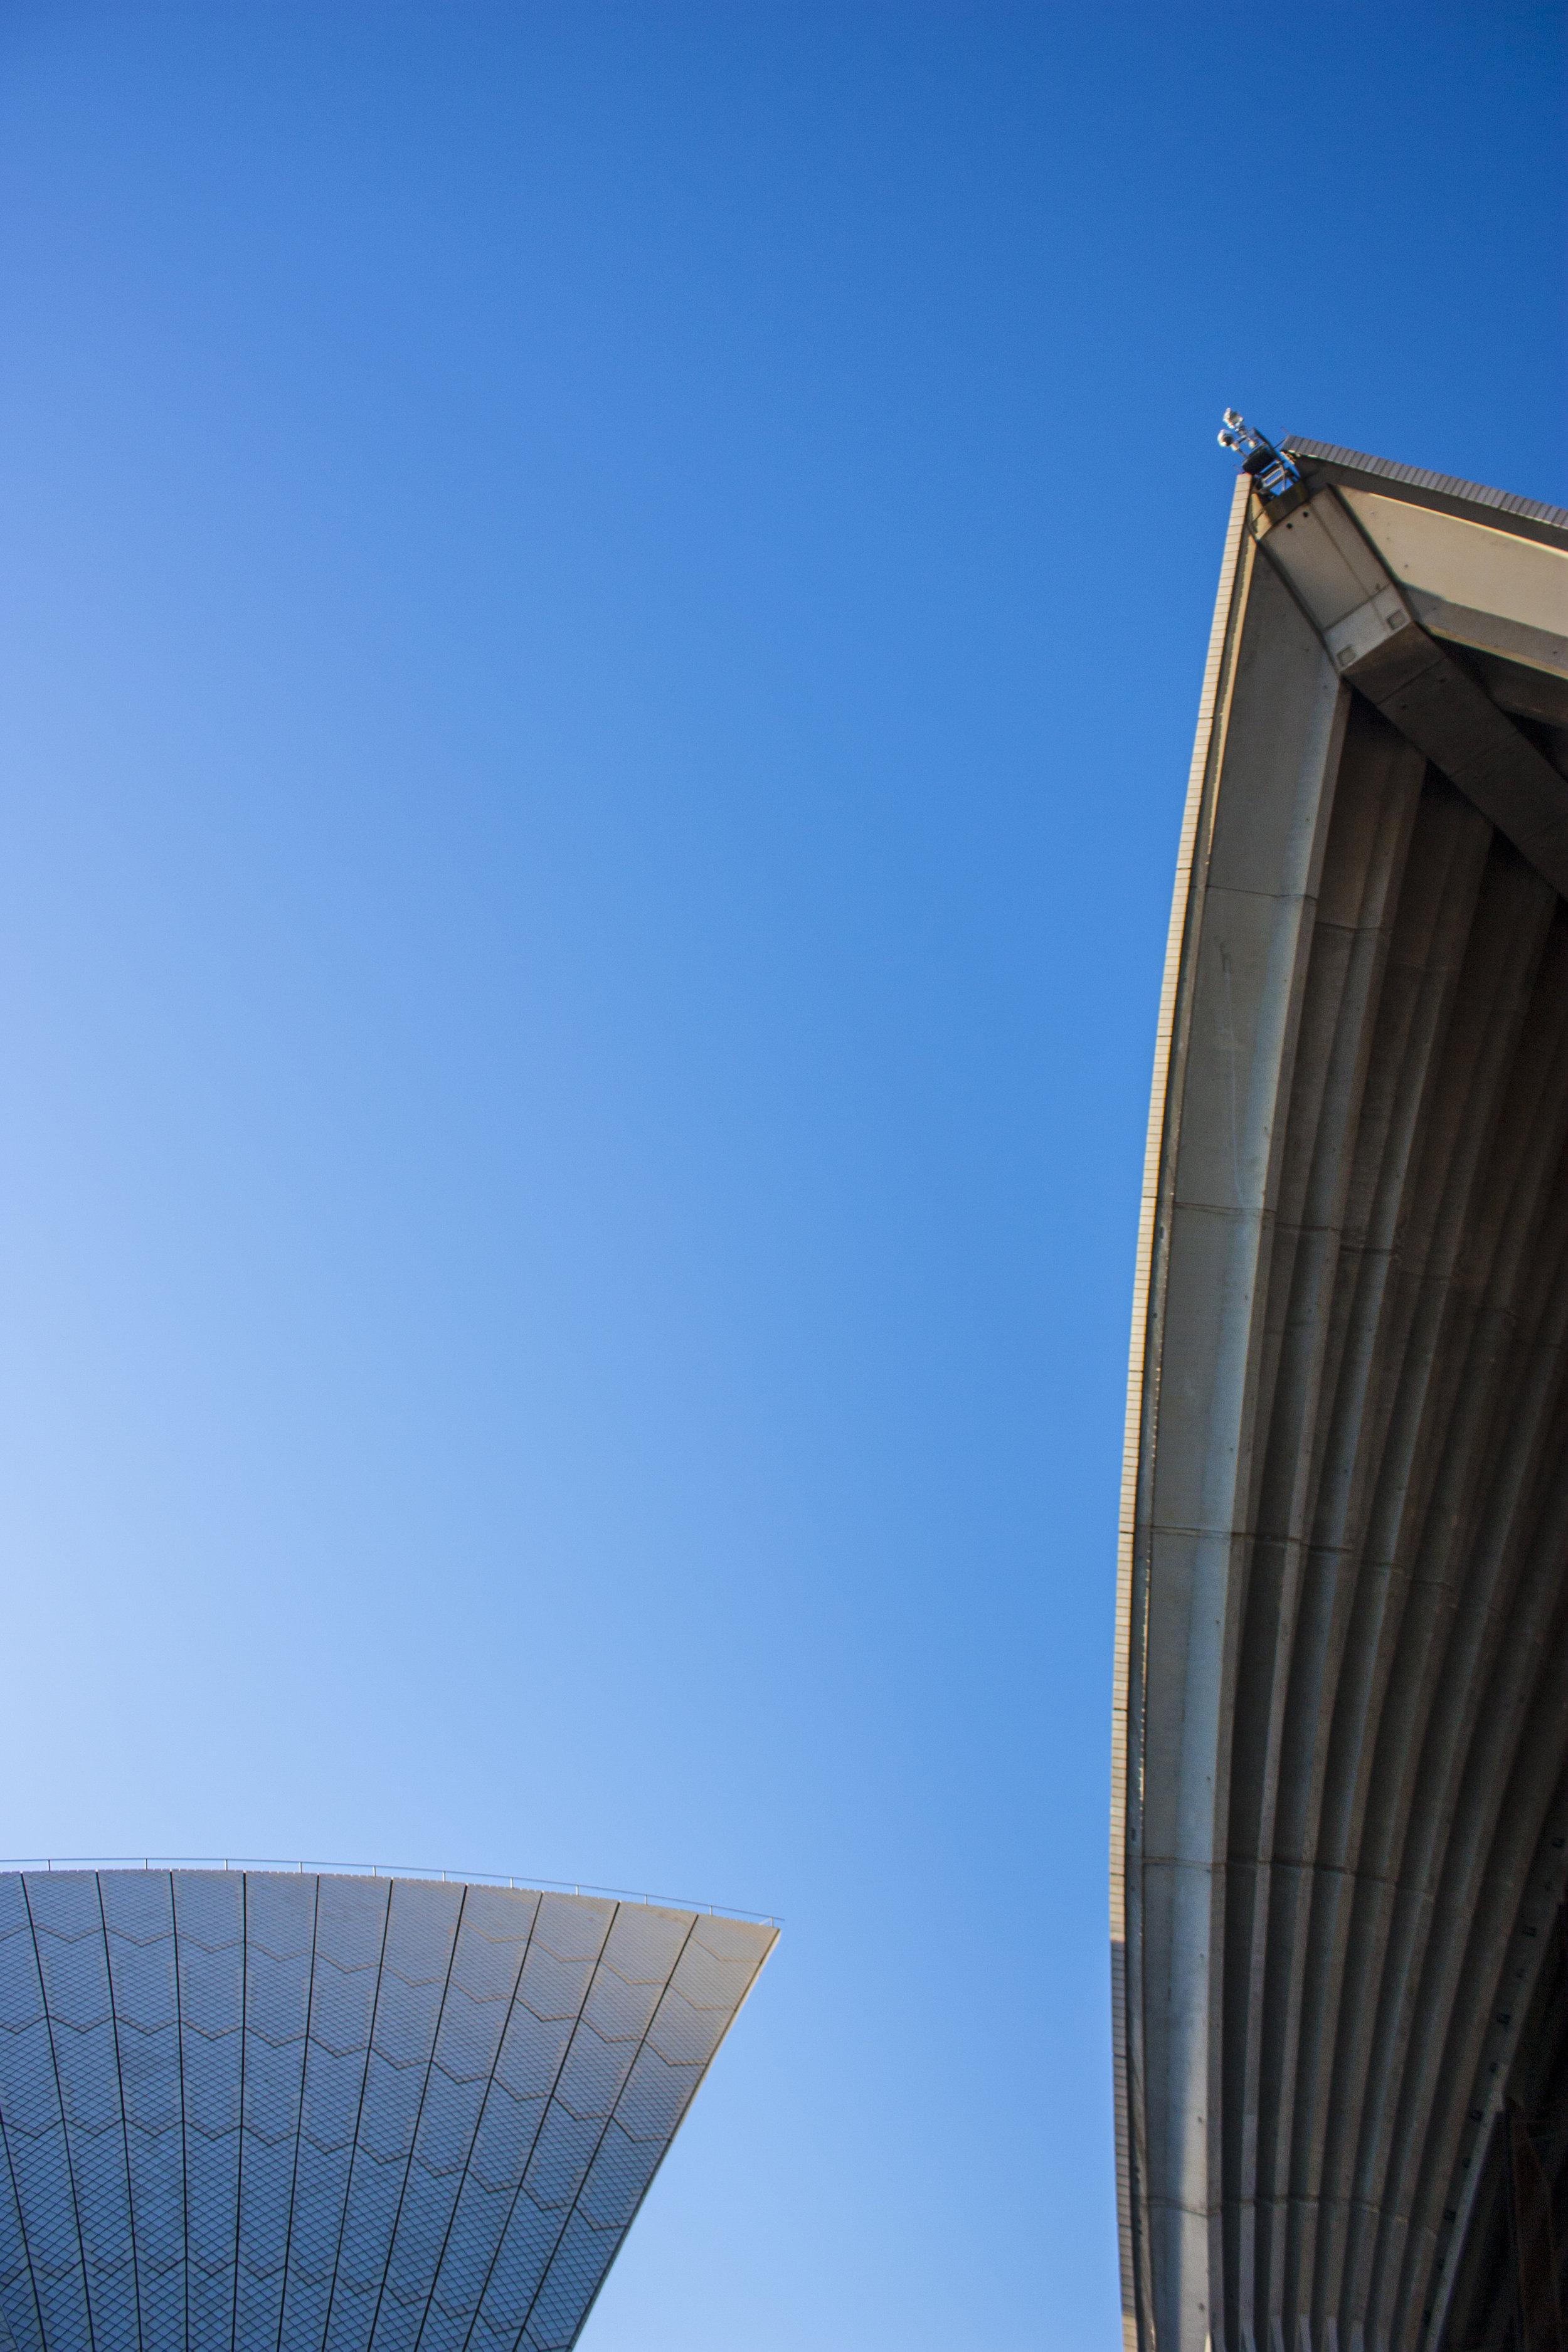 Australia_Sydney_Sydney Opera House_Two Sails.jpg